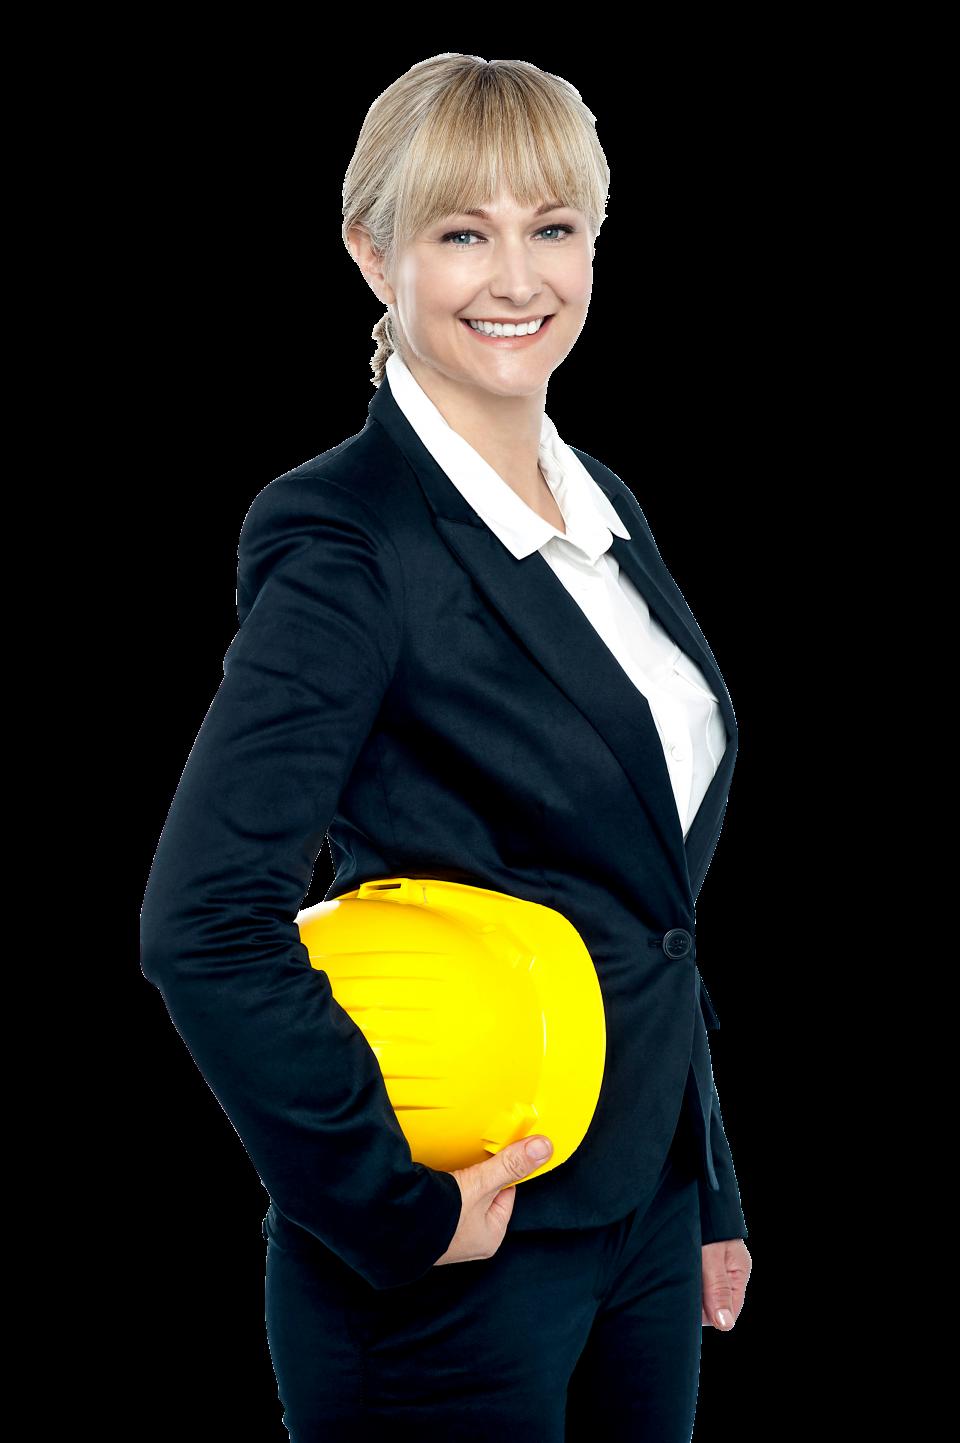 Women Architect PNG Image